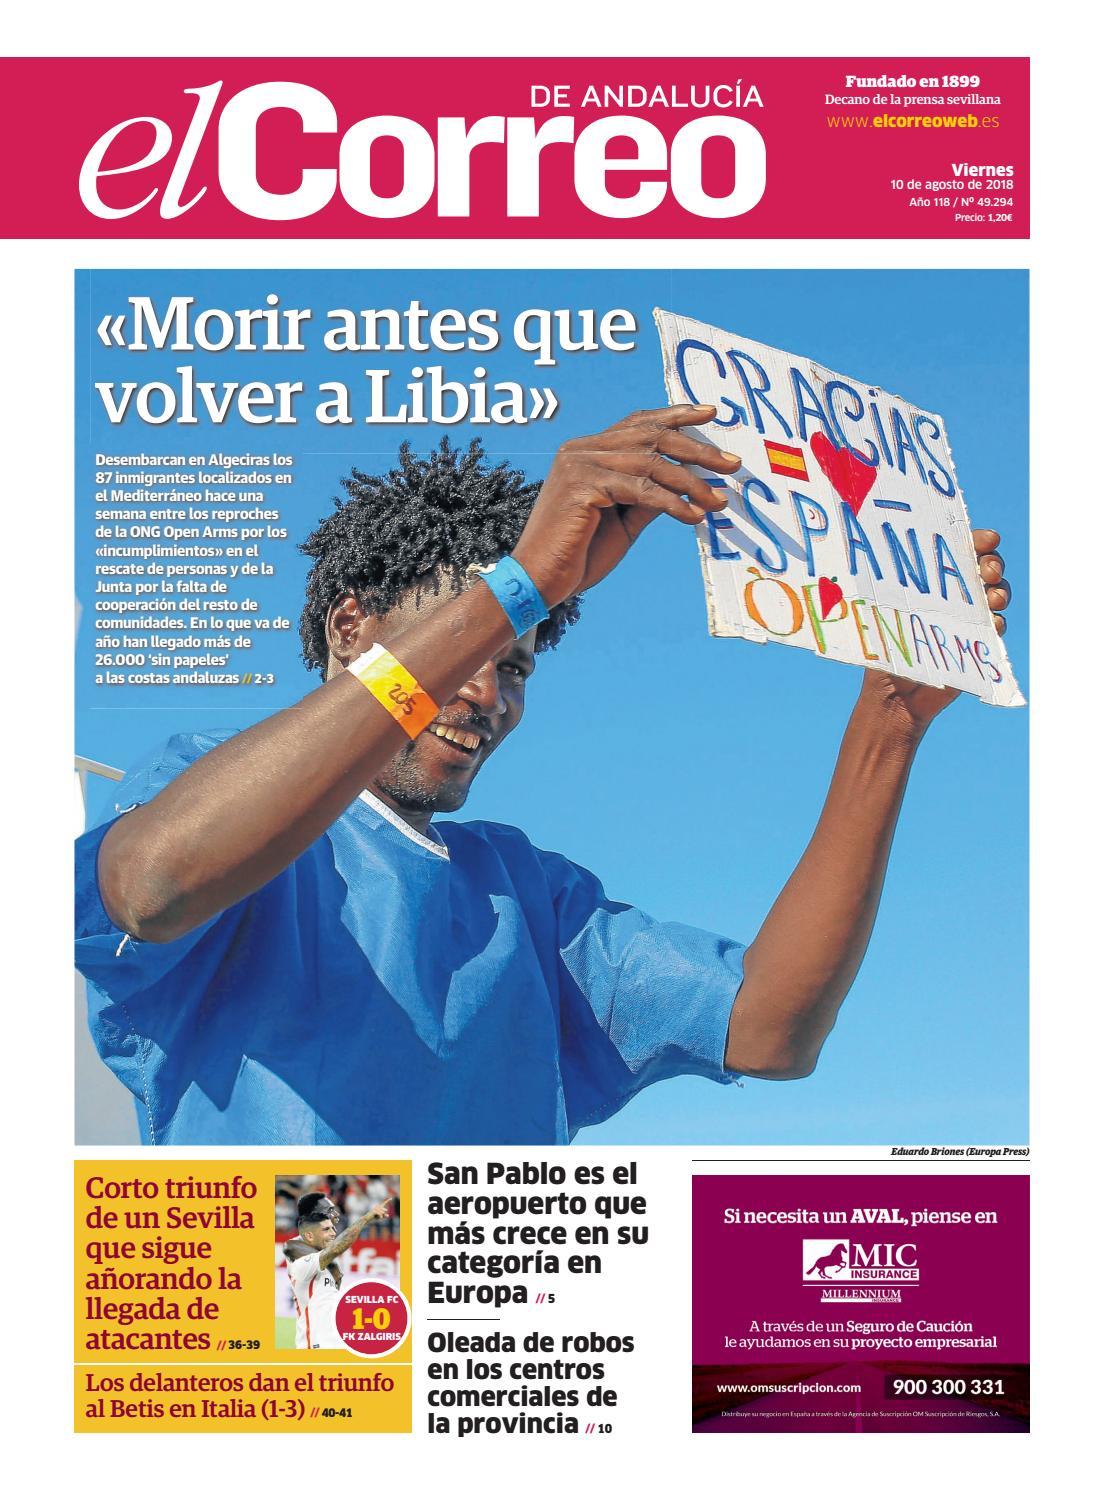 7249ba29d7528 10.08.2018 El Correo de Andalucía by EL CORREO DE ANDALUCÍA S.L. - issuu